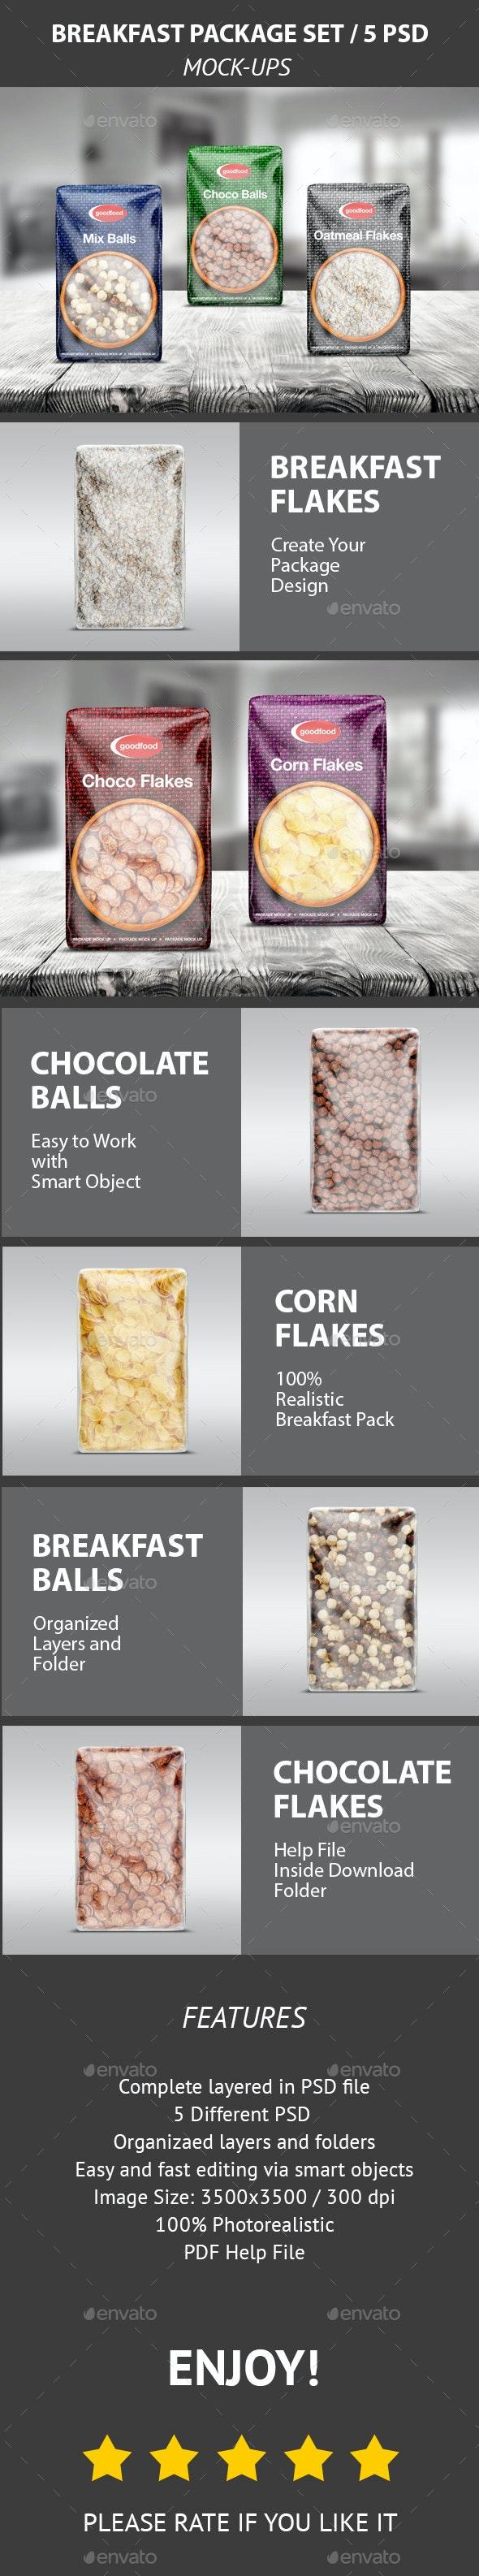 Breakfast Package Set Mock-Up / 5 PSD - Food and Drink Packaging